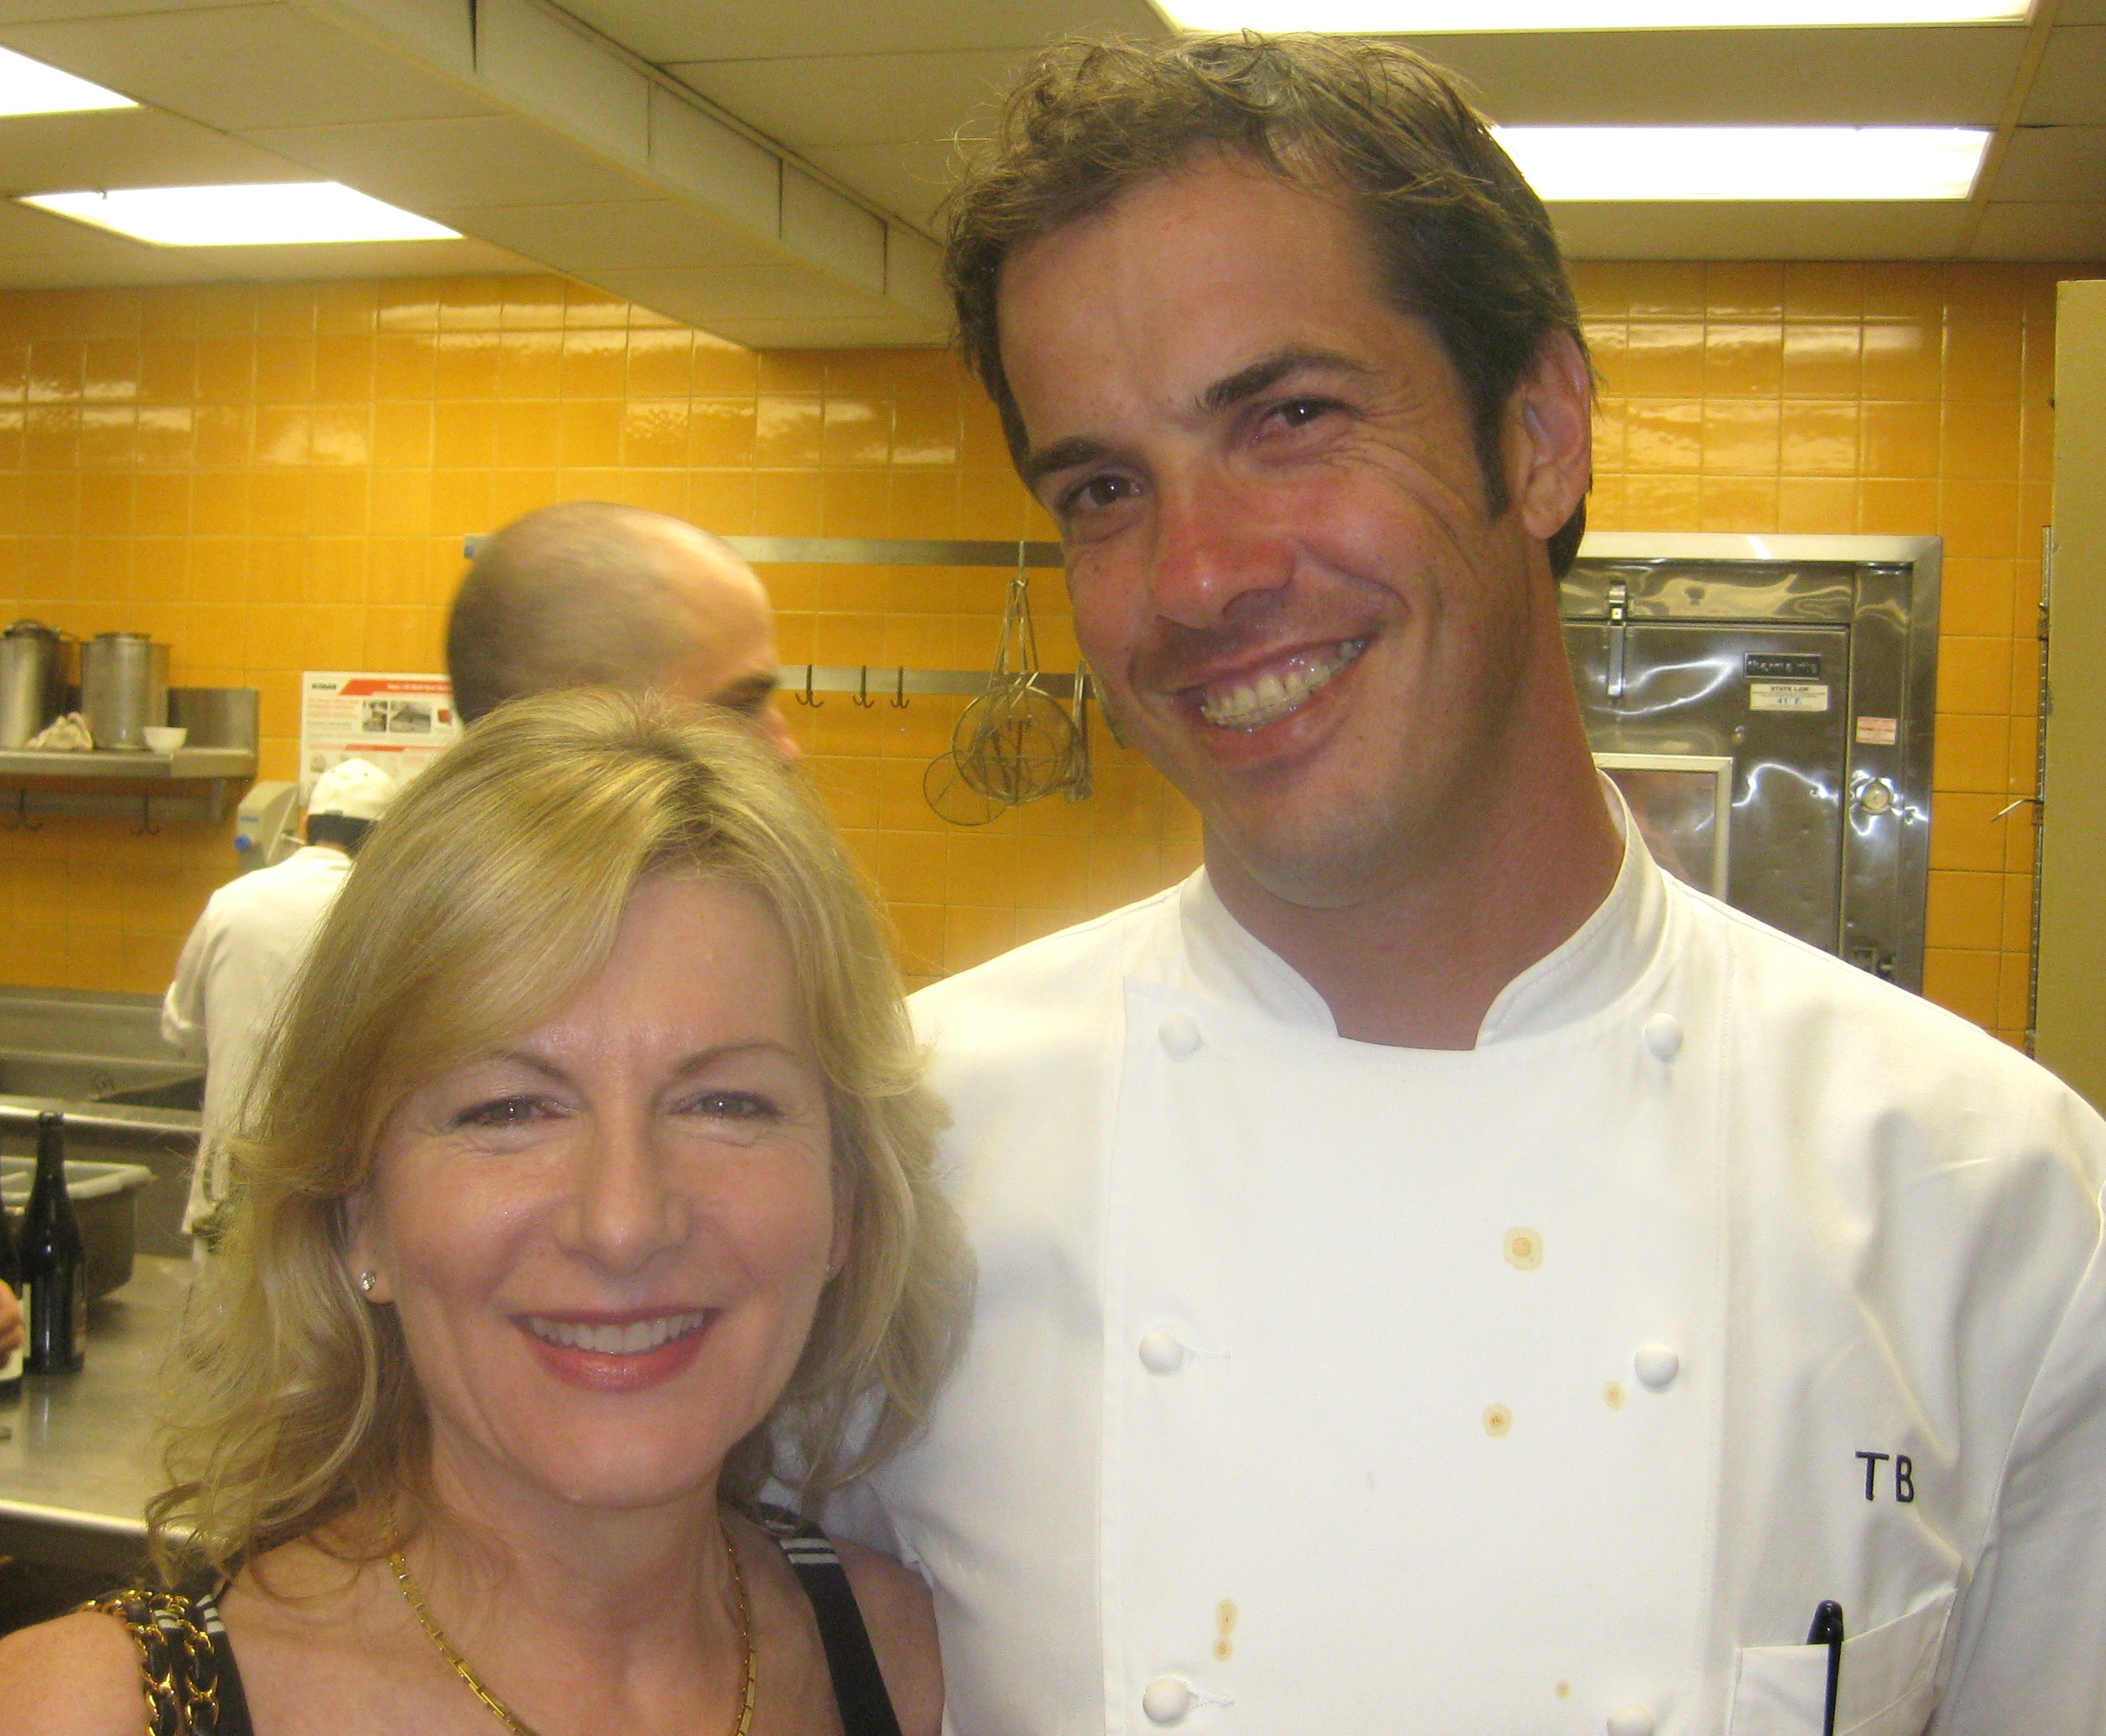 Spago's chef de cuisine Thomas Boyce with Janet Pucino